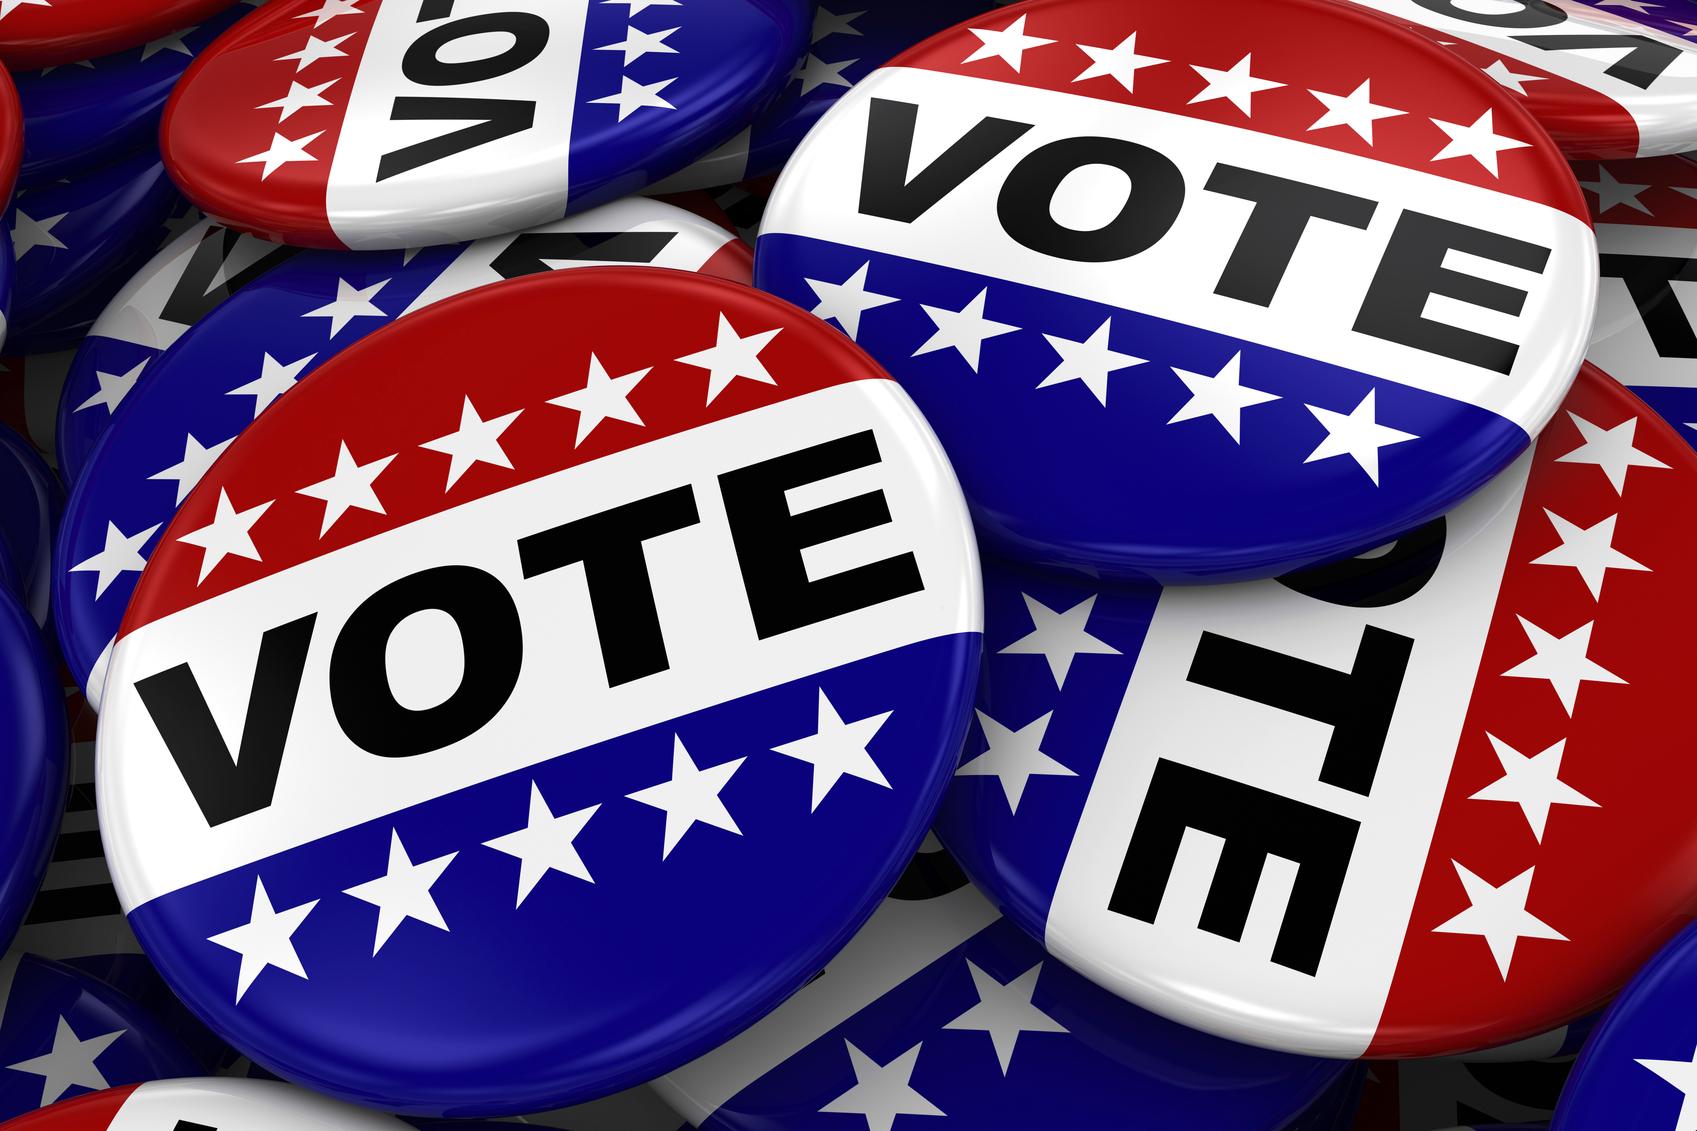 where to vote - photo #4